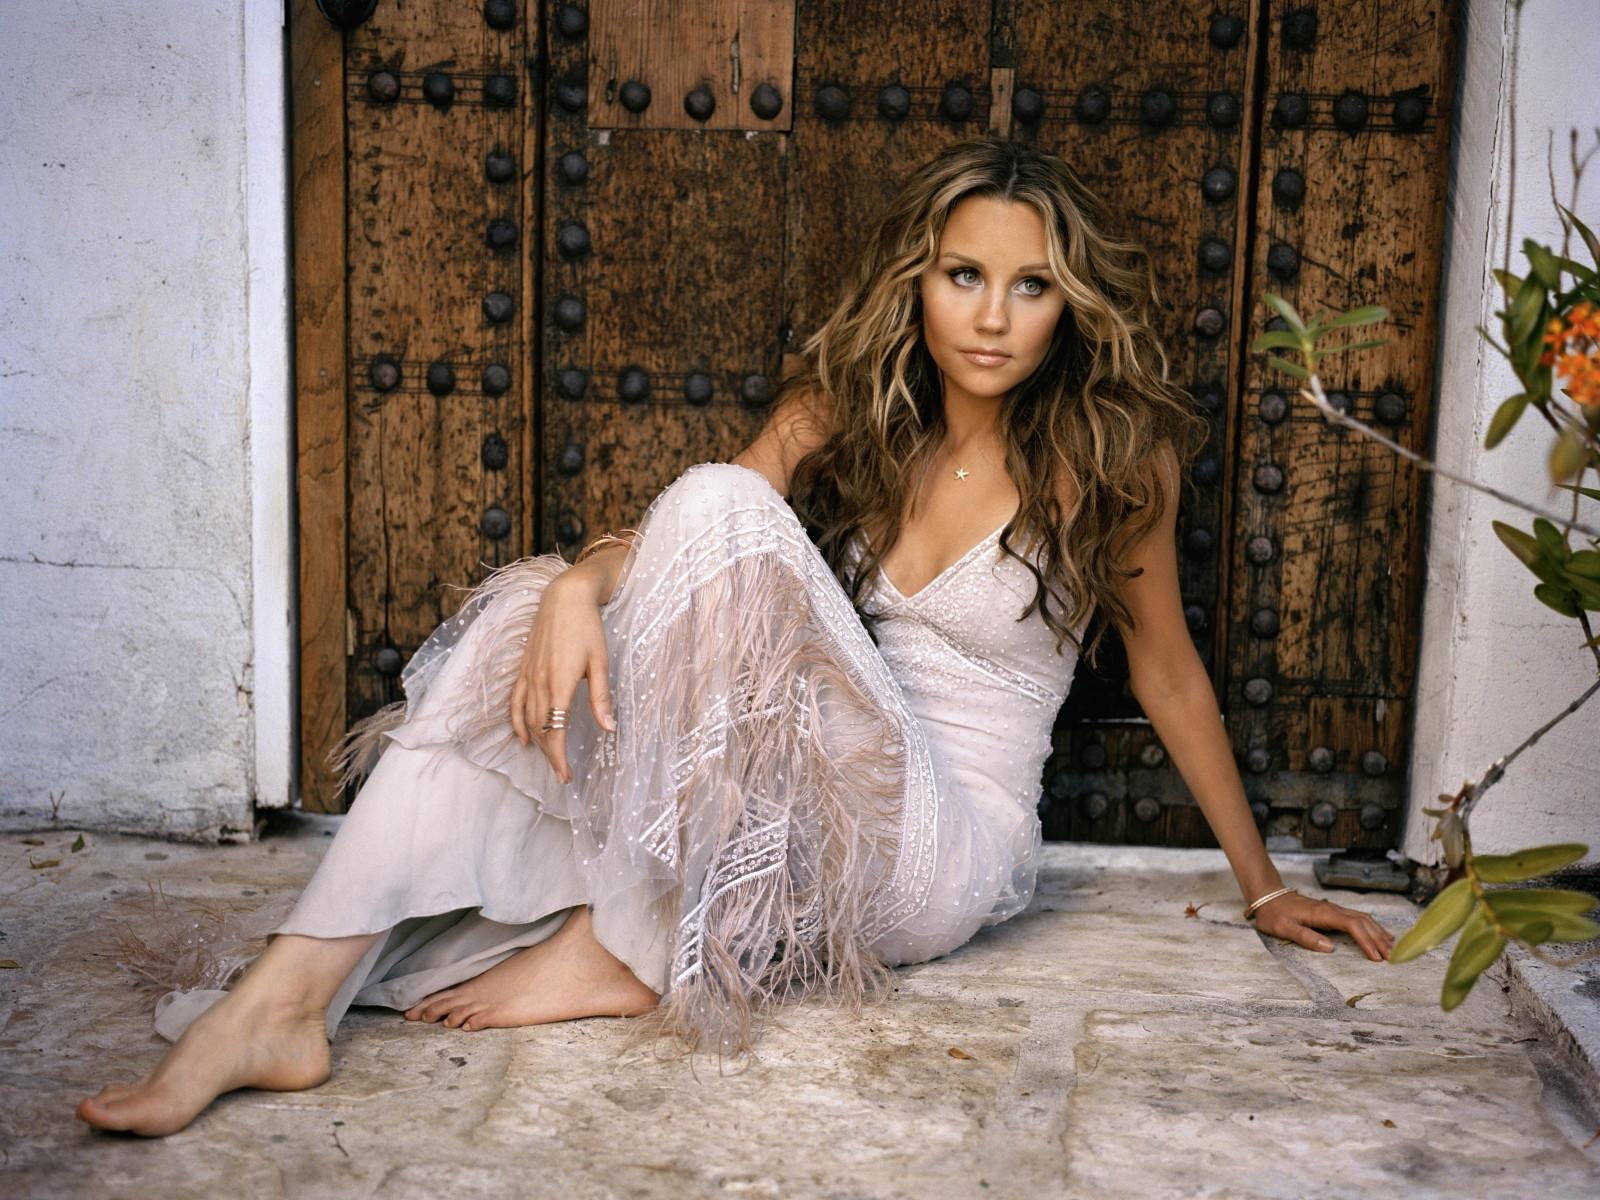 Amanda Bynes Hot Hd Wallpapers  Entertainment Exclusive -4465